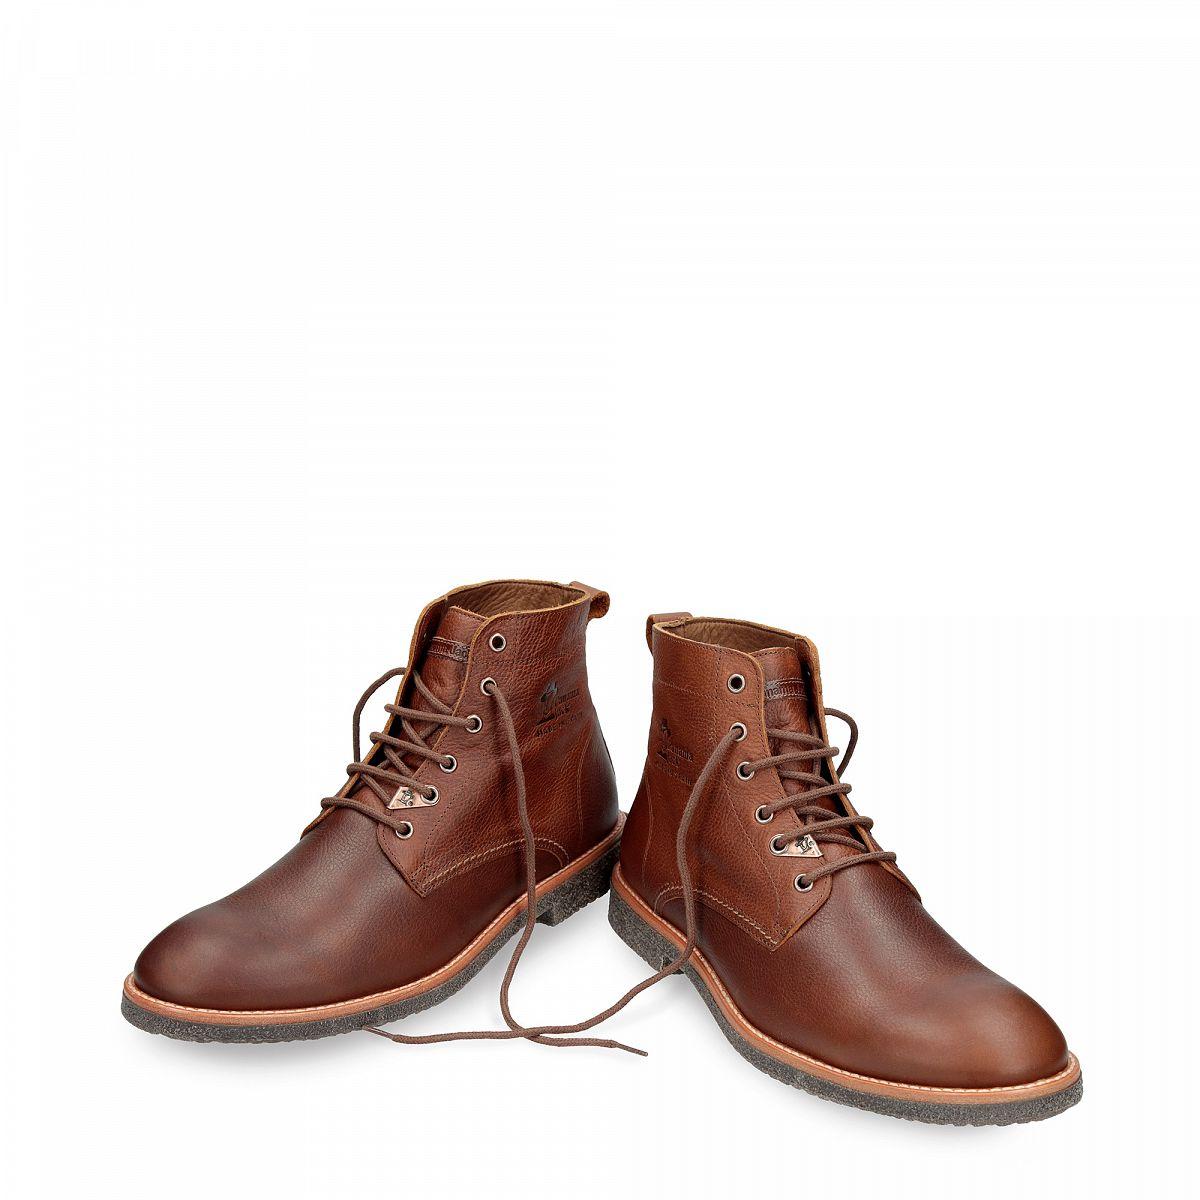 Men's Ankle Boot GLASGOW Tan